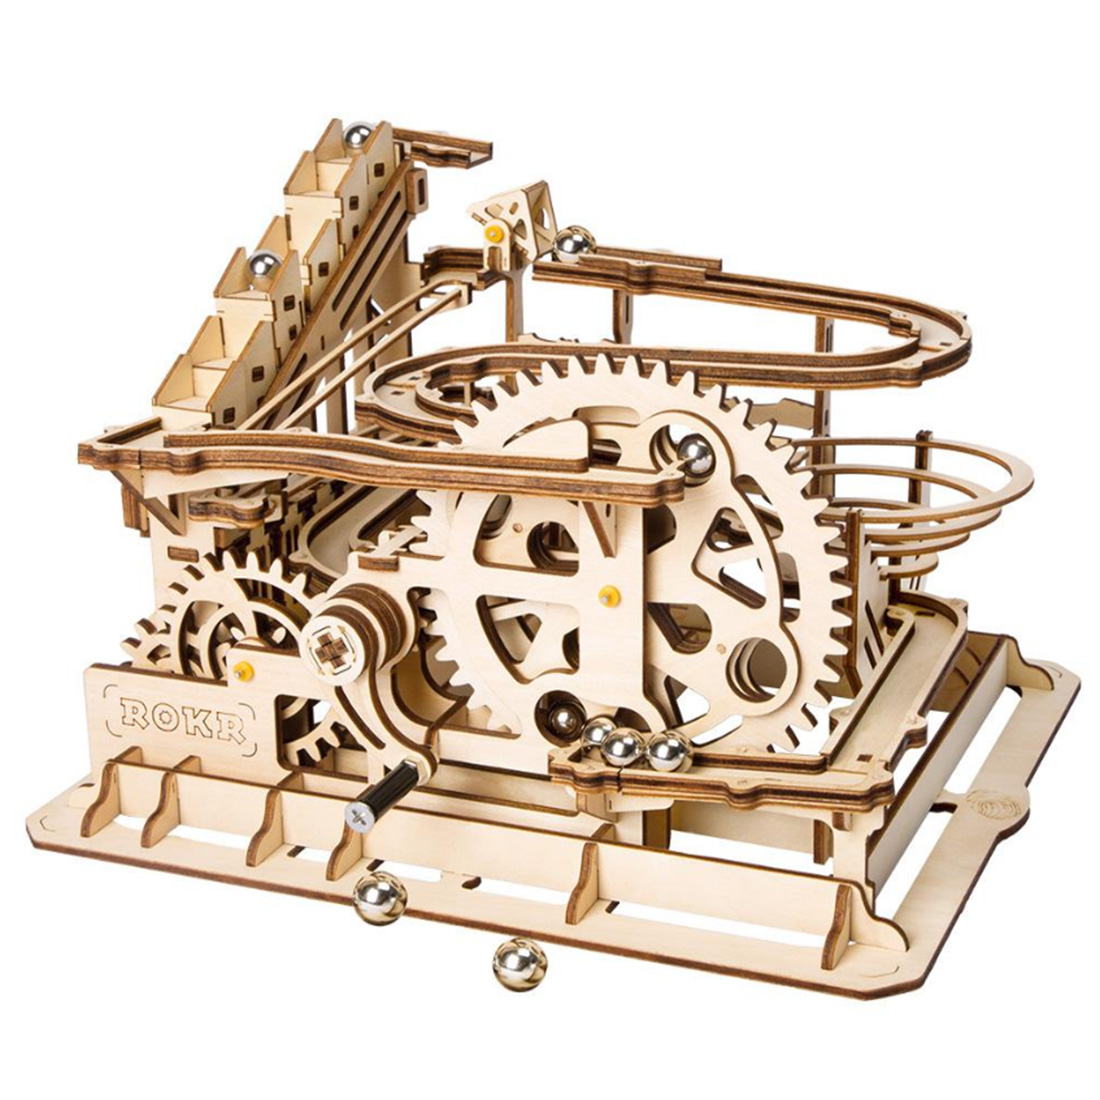 Surwish Waterwheel Coaster Shape 3D Painting Puzzle DIY Assemble Stem Toys For Kids Braining